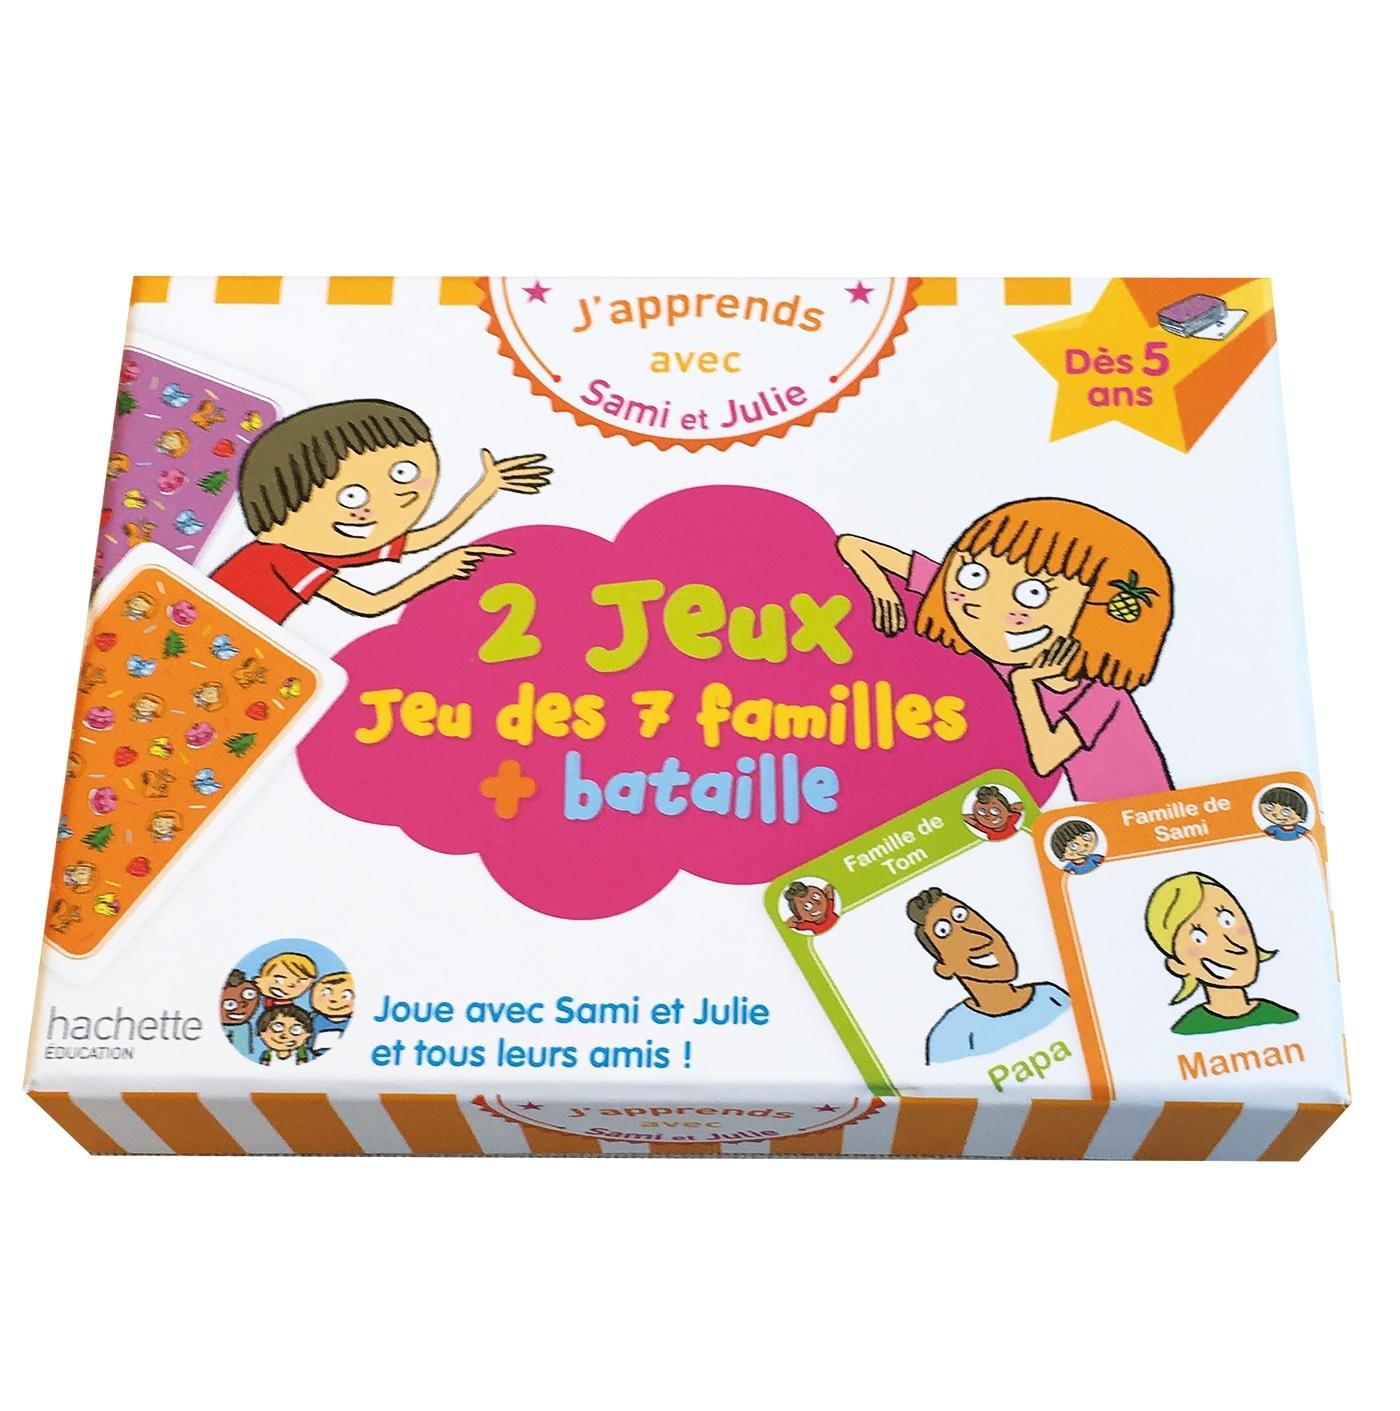 J'APPRENDS AVEC SAMI ET JULIE : JEU DES 7 FAMILLES + BATAILLE